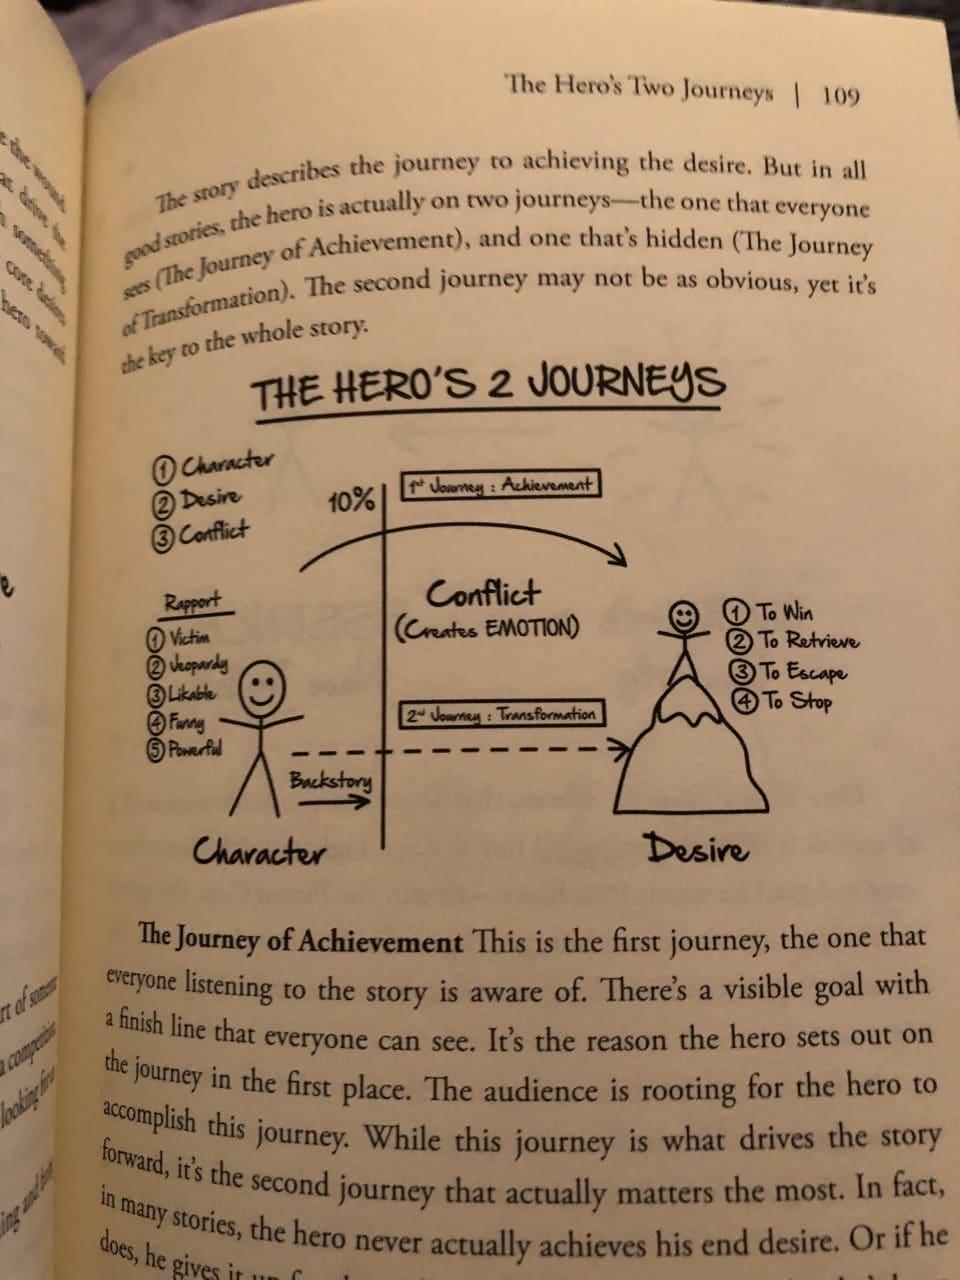 heros two journeys from expert secrets clickfunnels